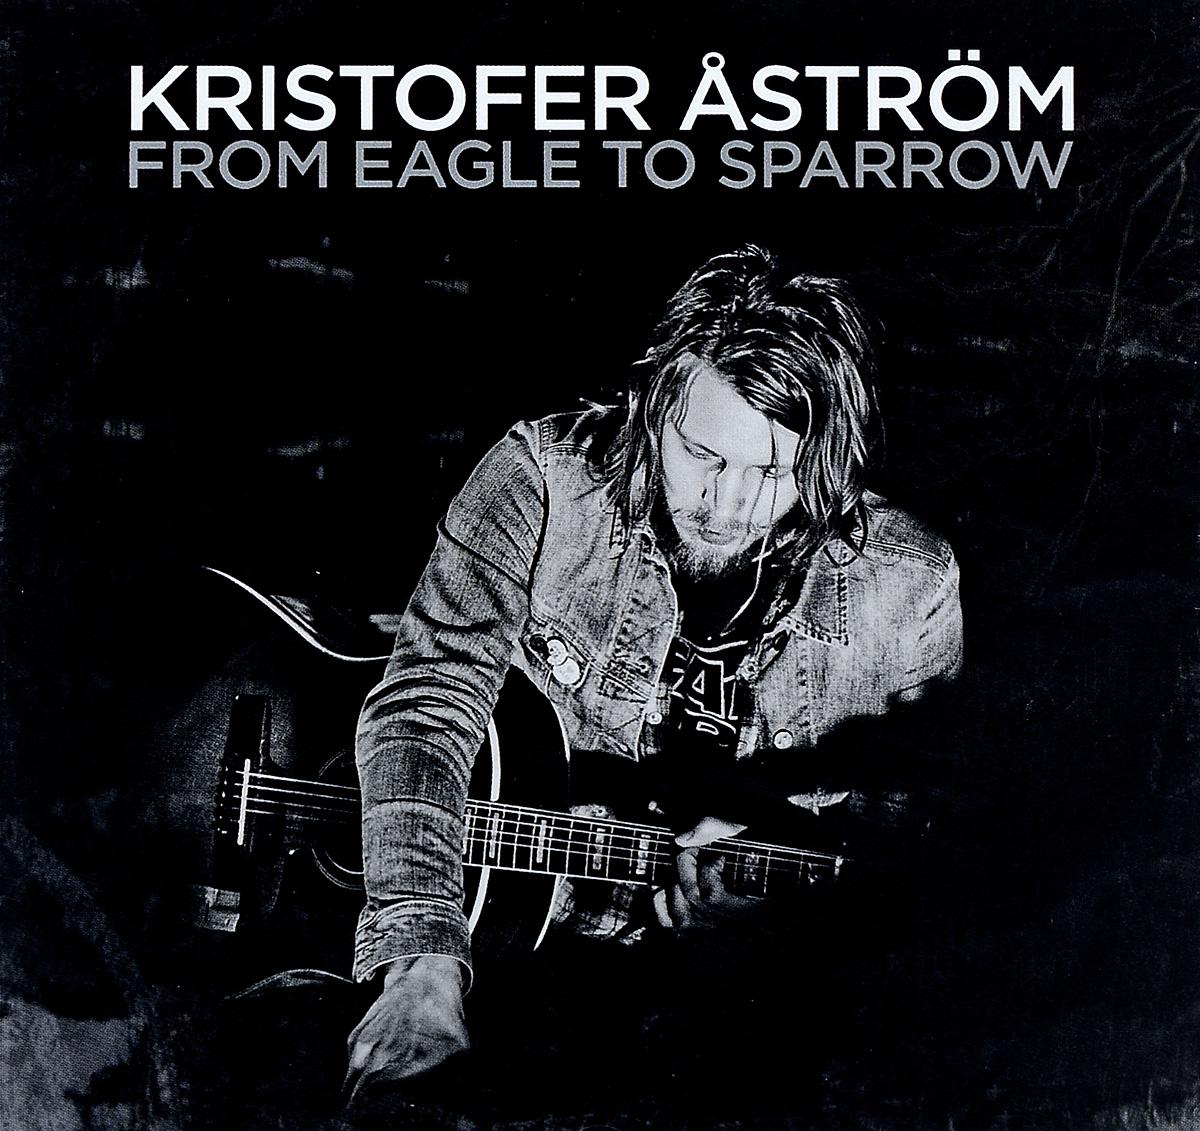 Кристофер Астром Kristofer Astrom. From Eagle To Sparrow